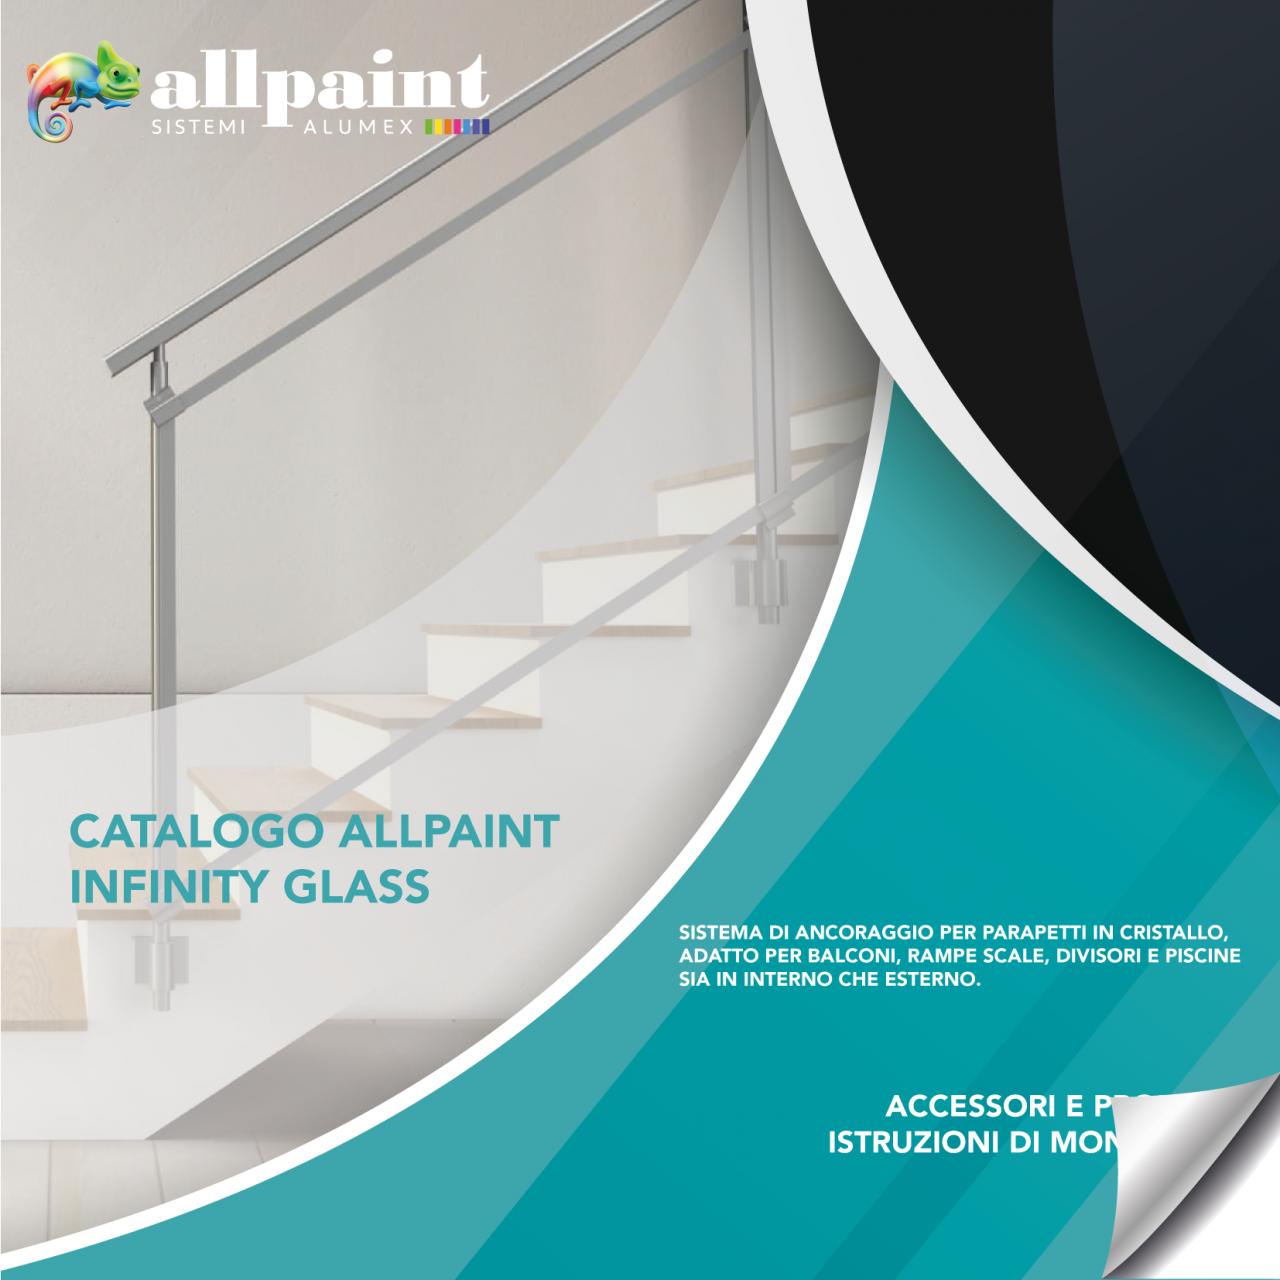 https://www.allpaint.it/wp-content/uploads/2021/08/Tavola-disegno-5-copia-5-1280x1280.png